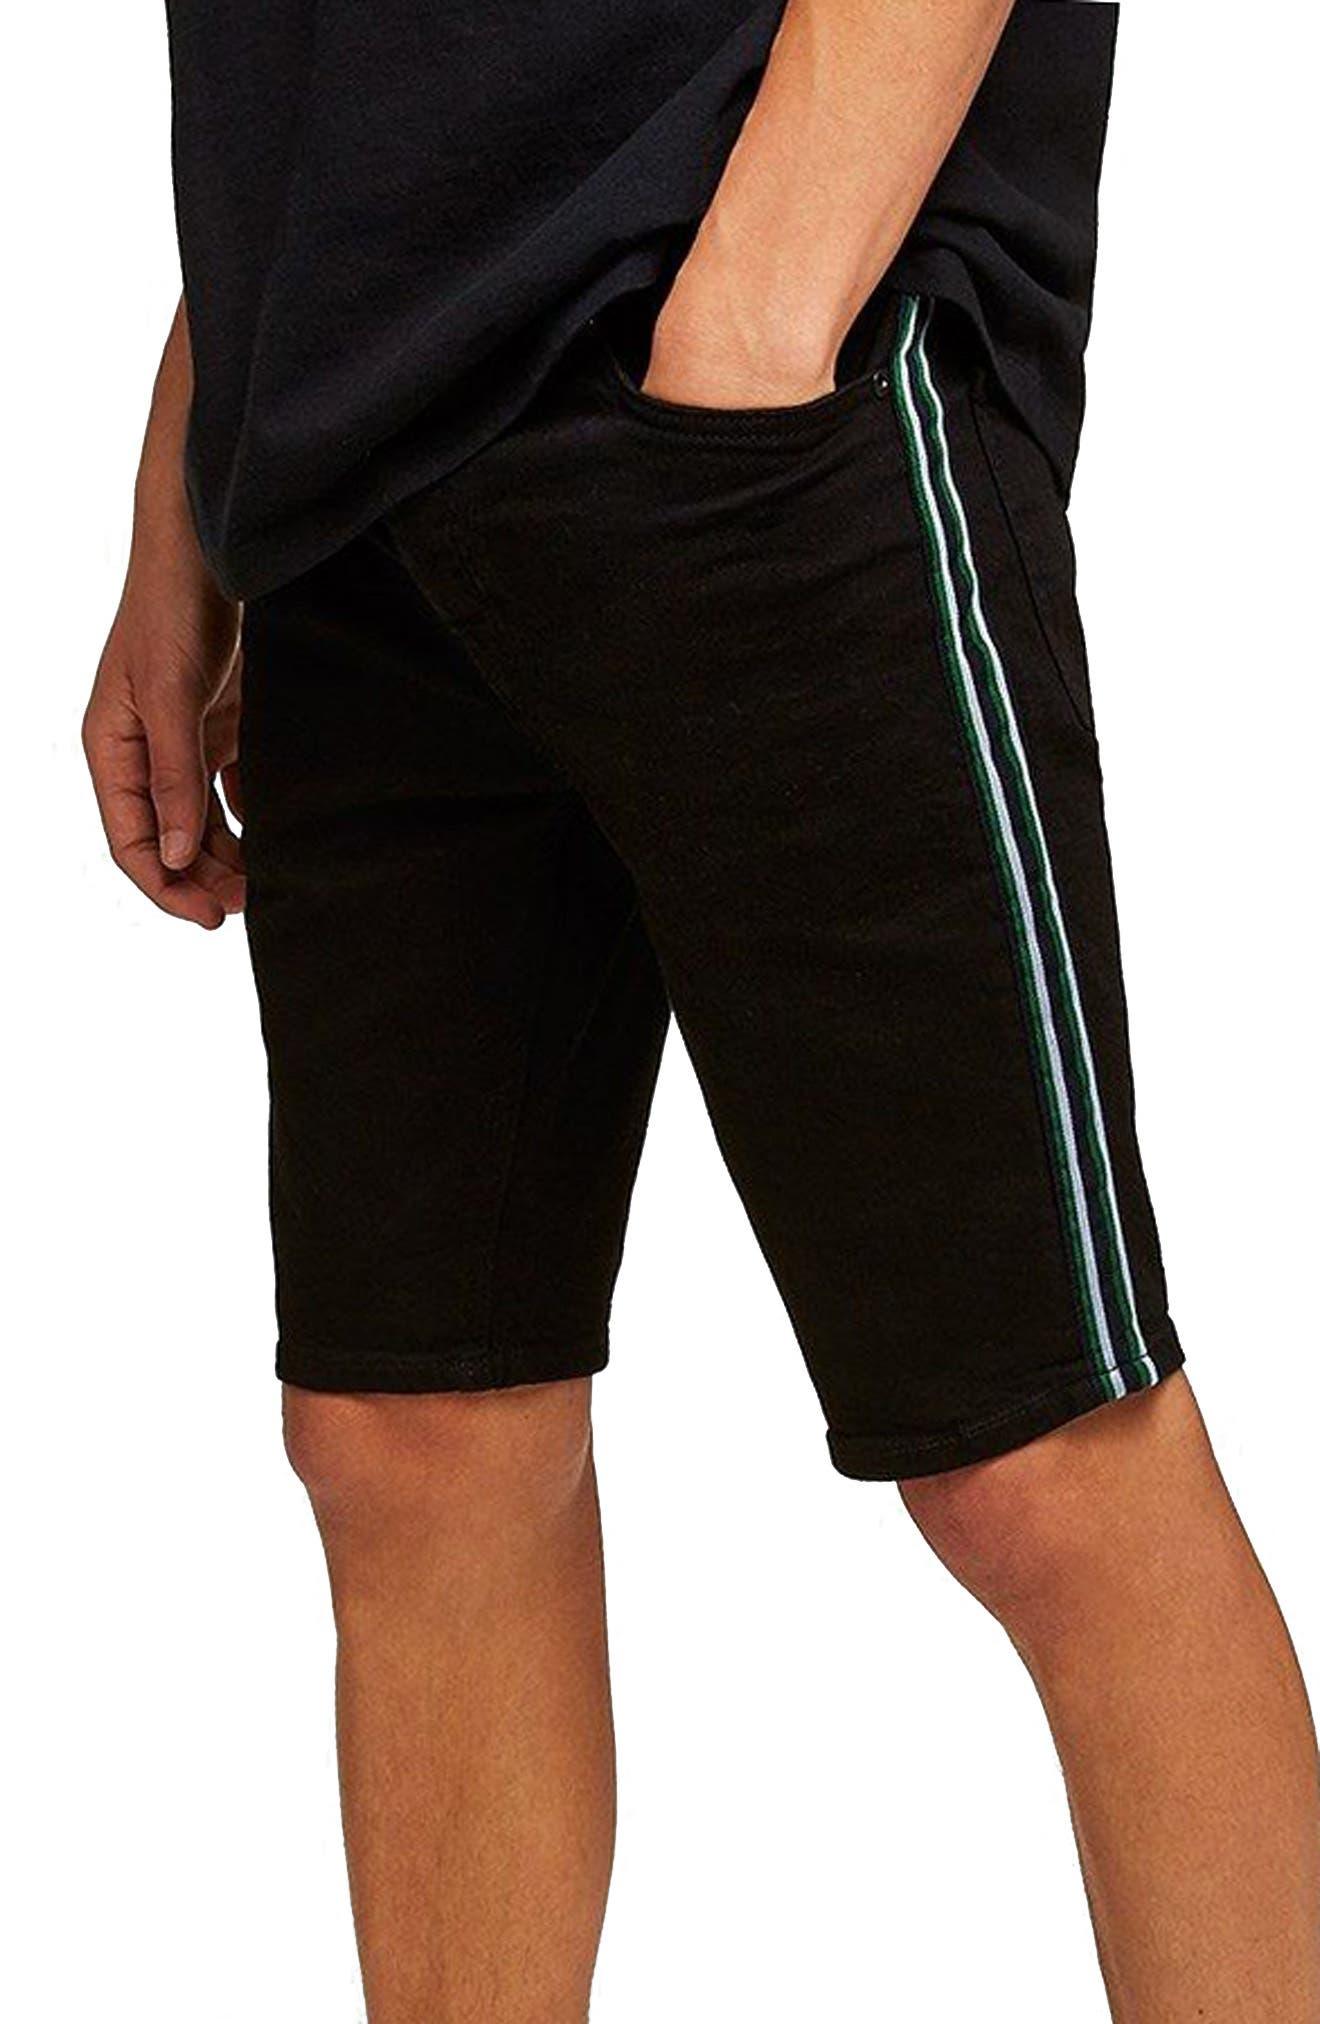 Tape Stretch Skinny Fit Denim Shorts,                         Main,                         color, 001